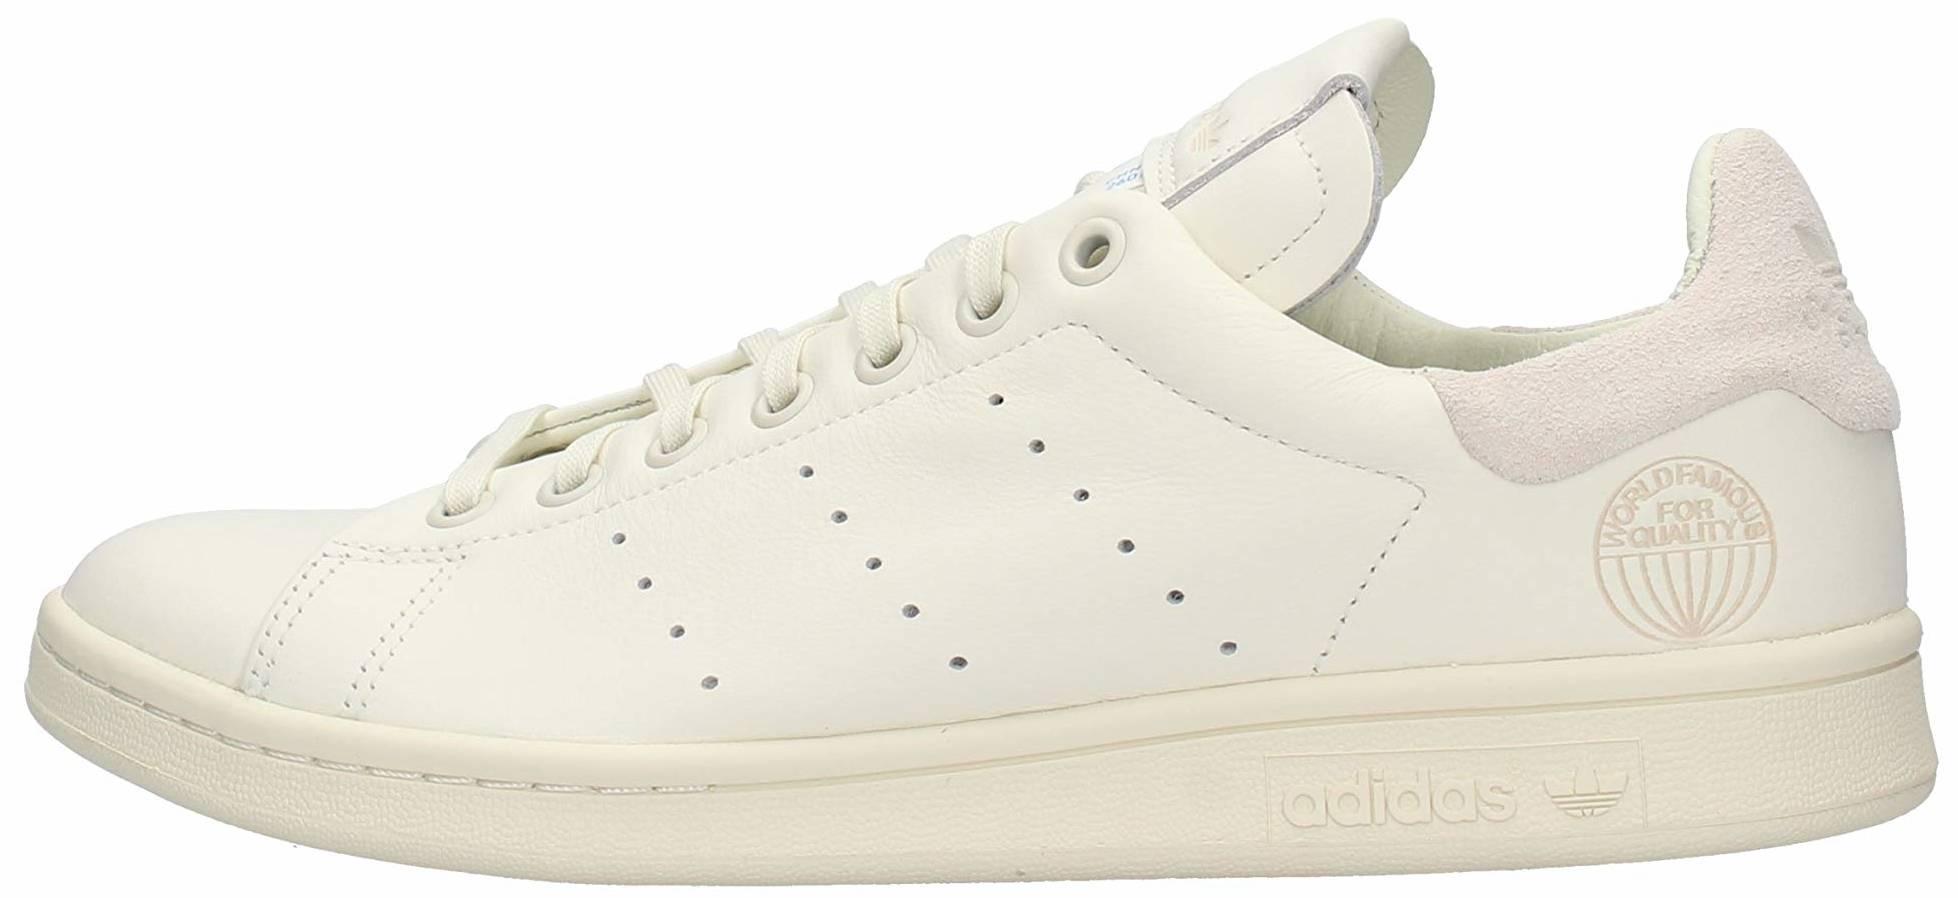 10 Adidas Stan Smith sneakers - Save 49% | RunRepeat